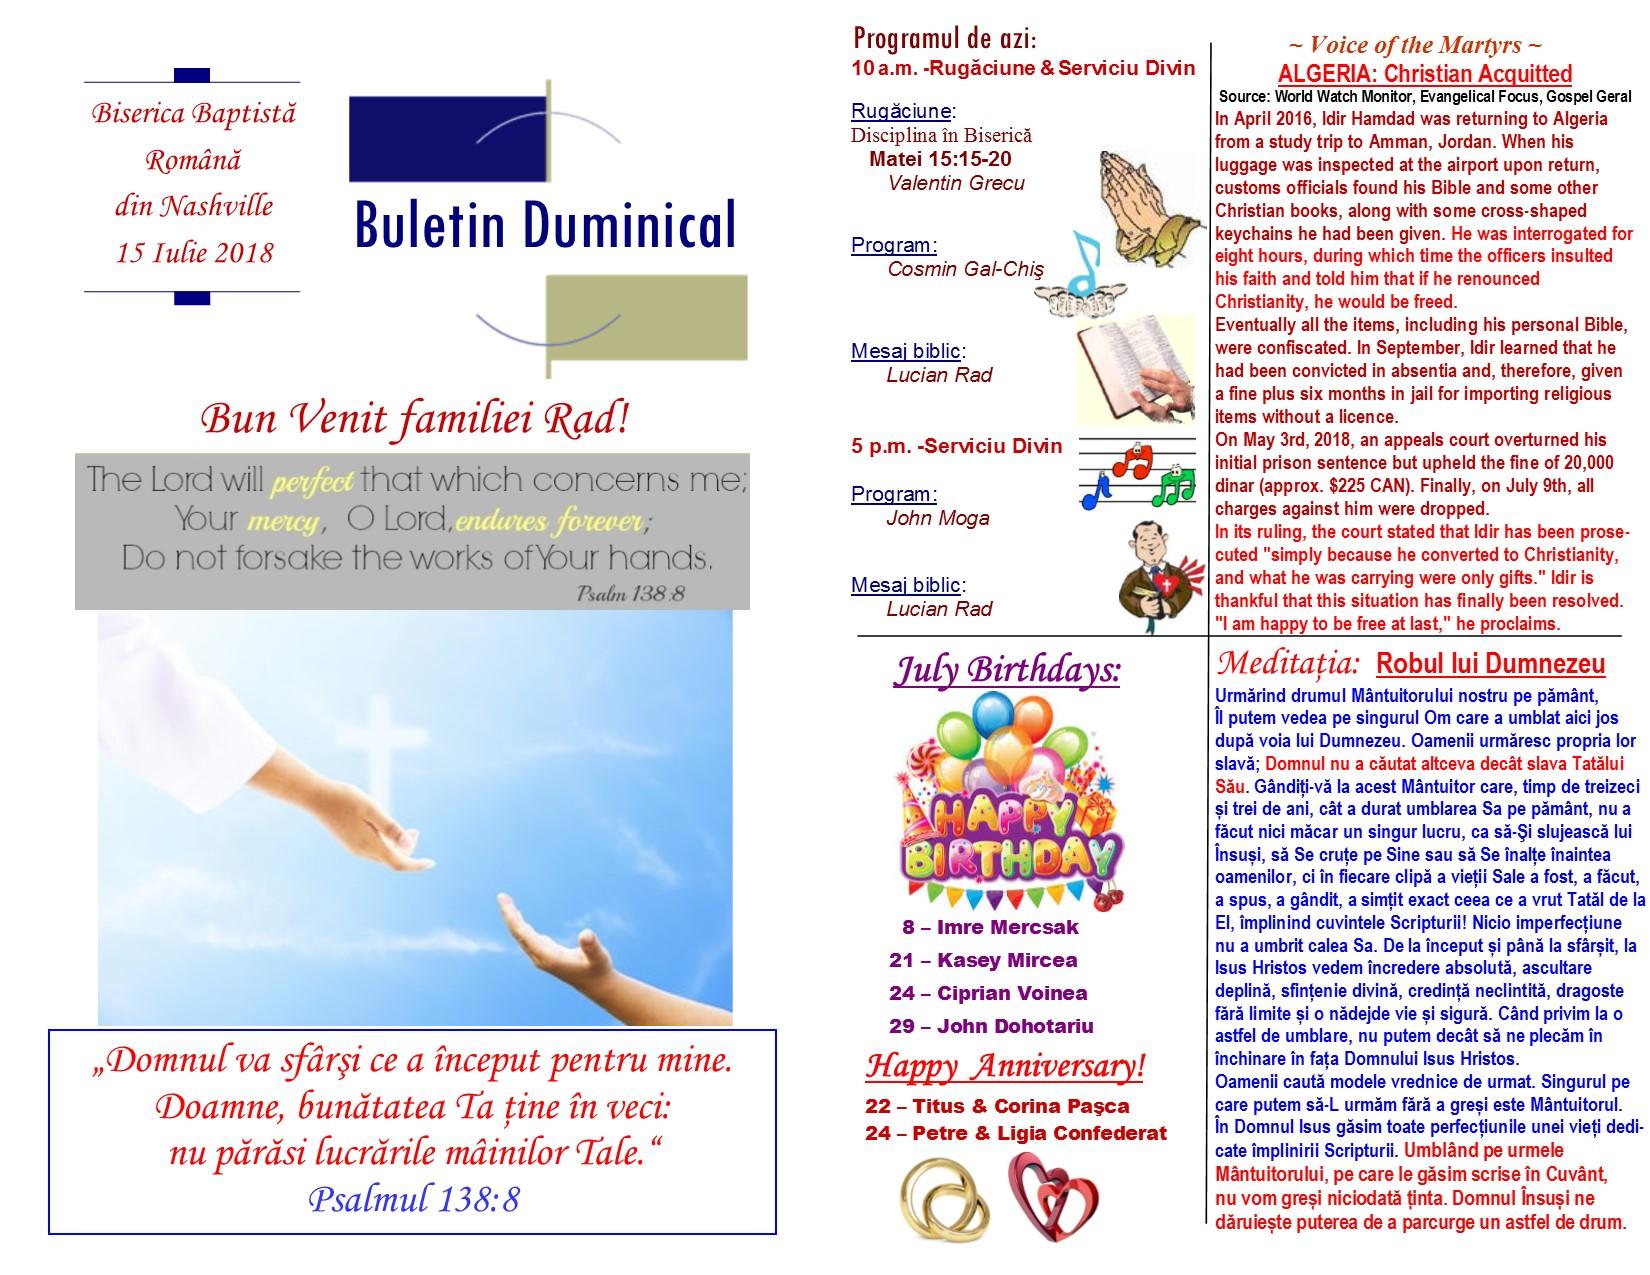 Buletin 07-15-18 page 1 & 2